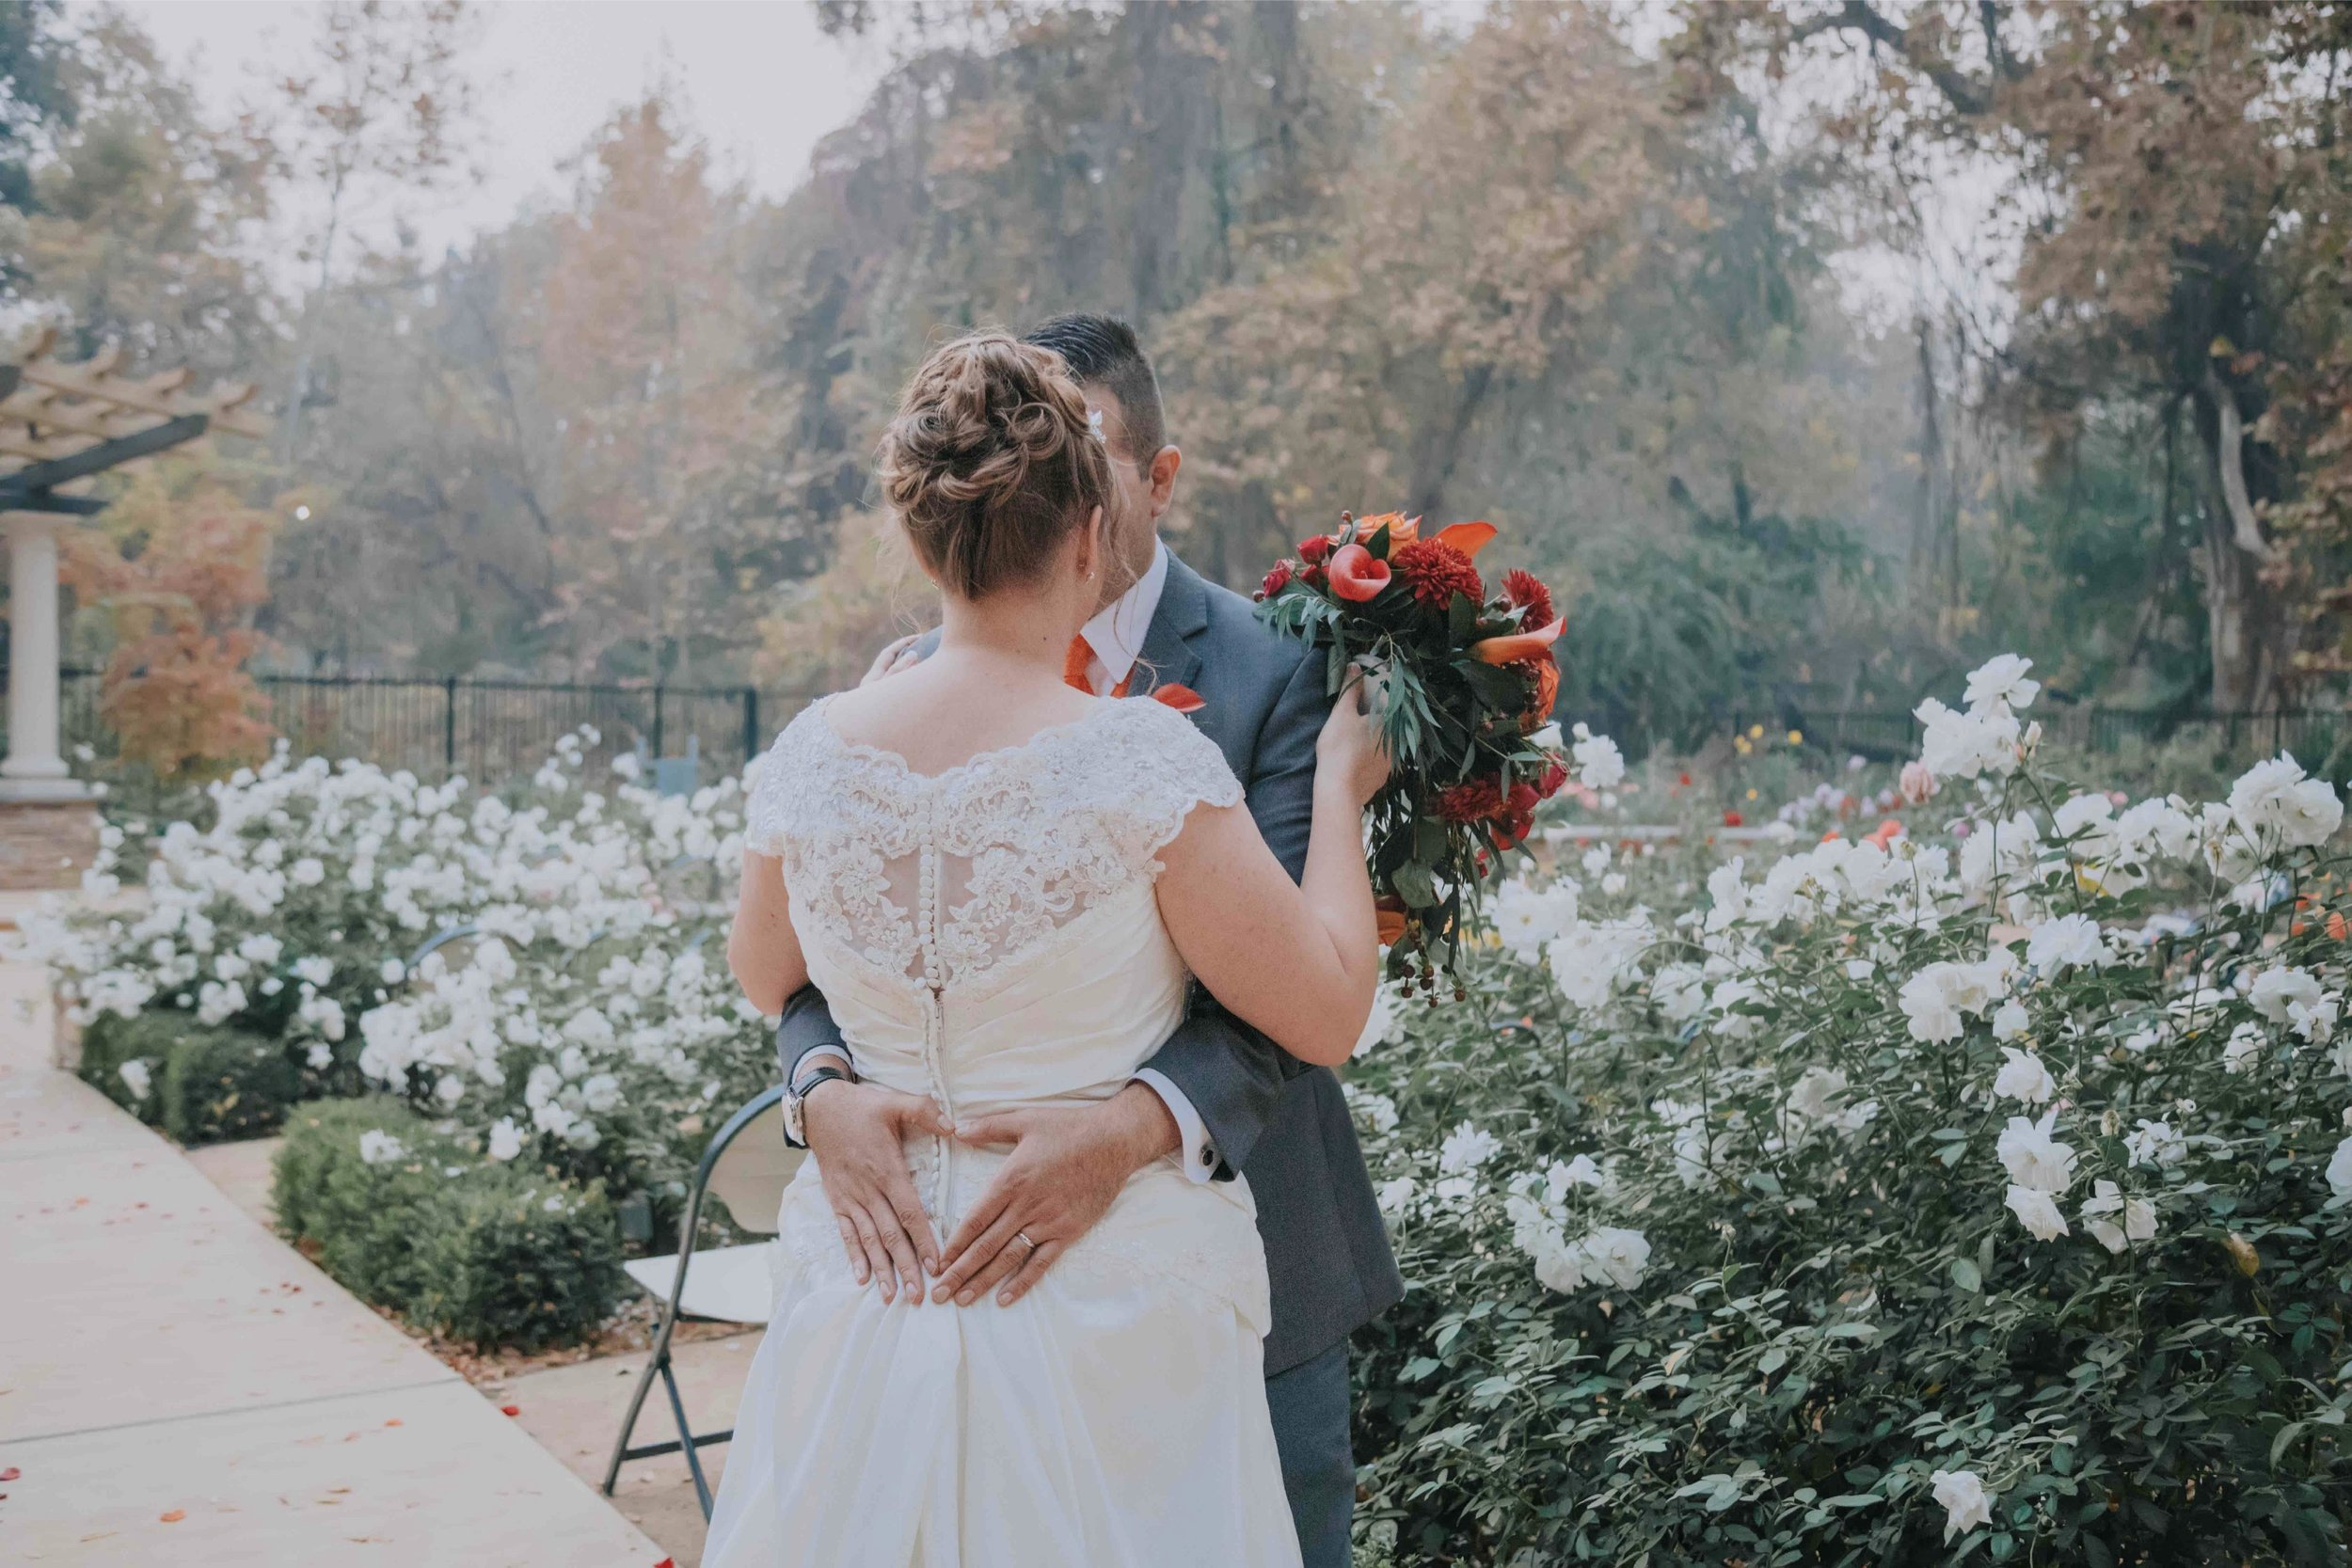 Creekside rose garden wedding photography chico_18.jpg